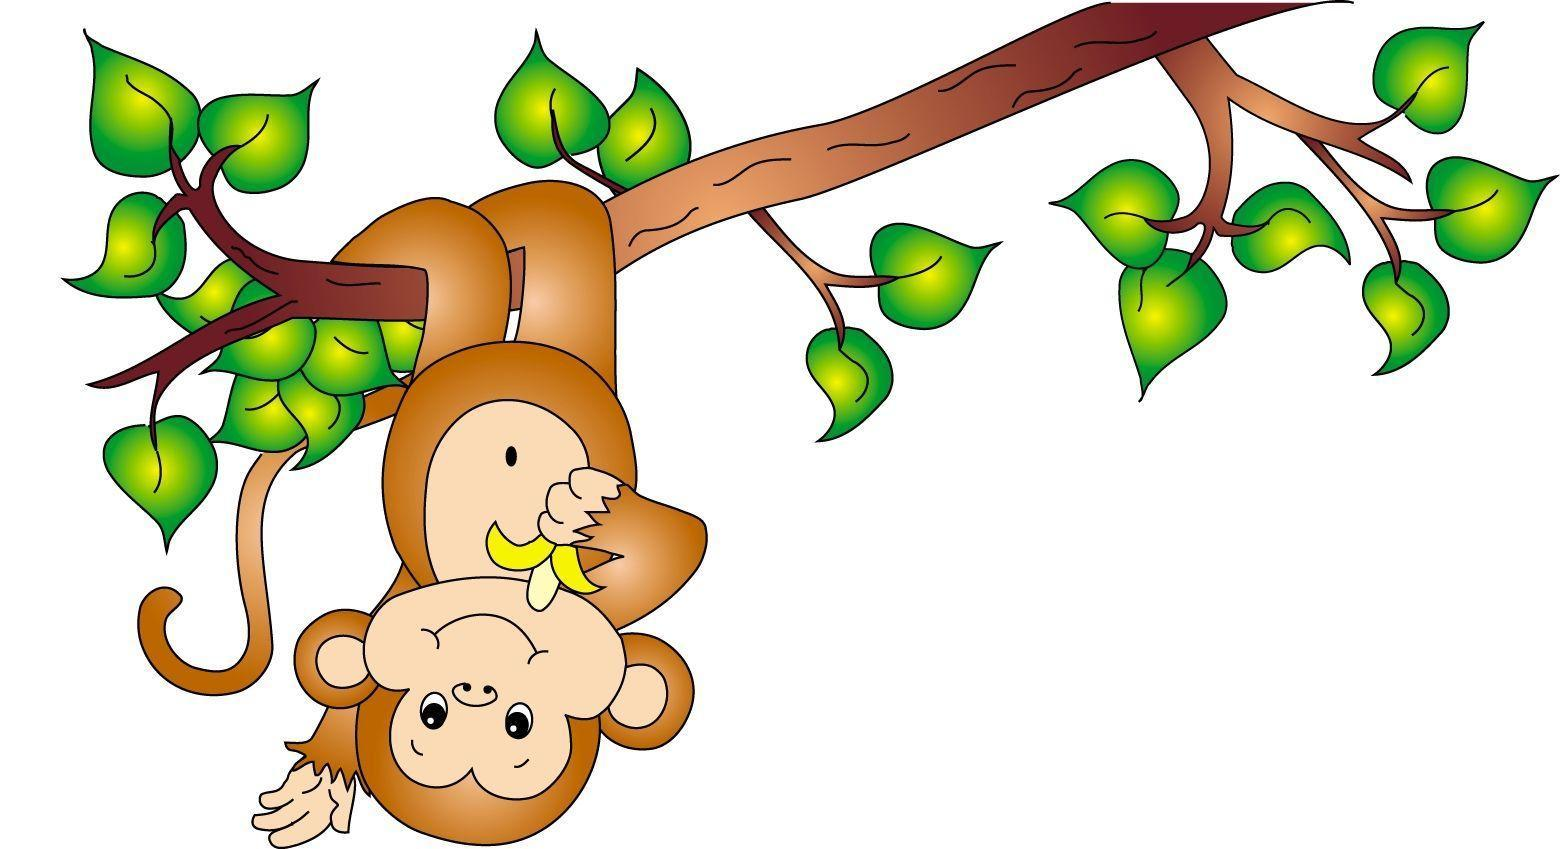 monkey cartoon wallpaper - photo #18